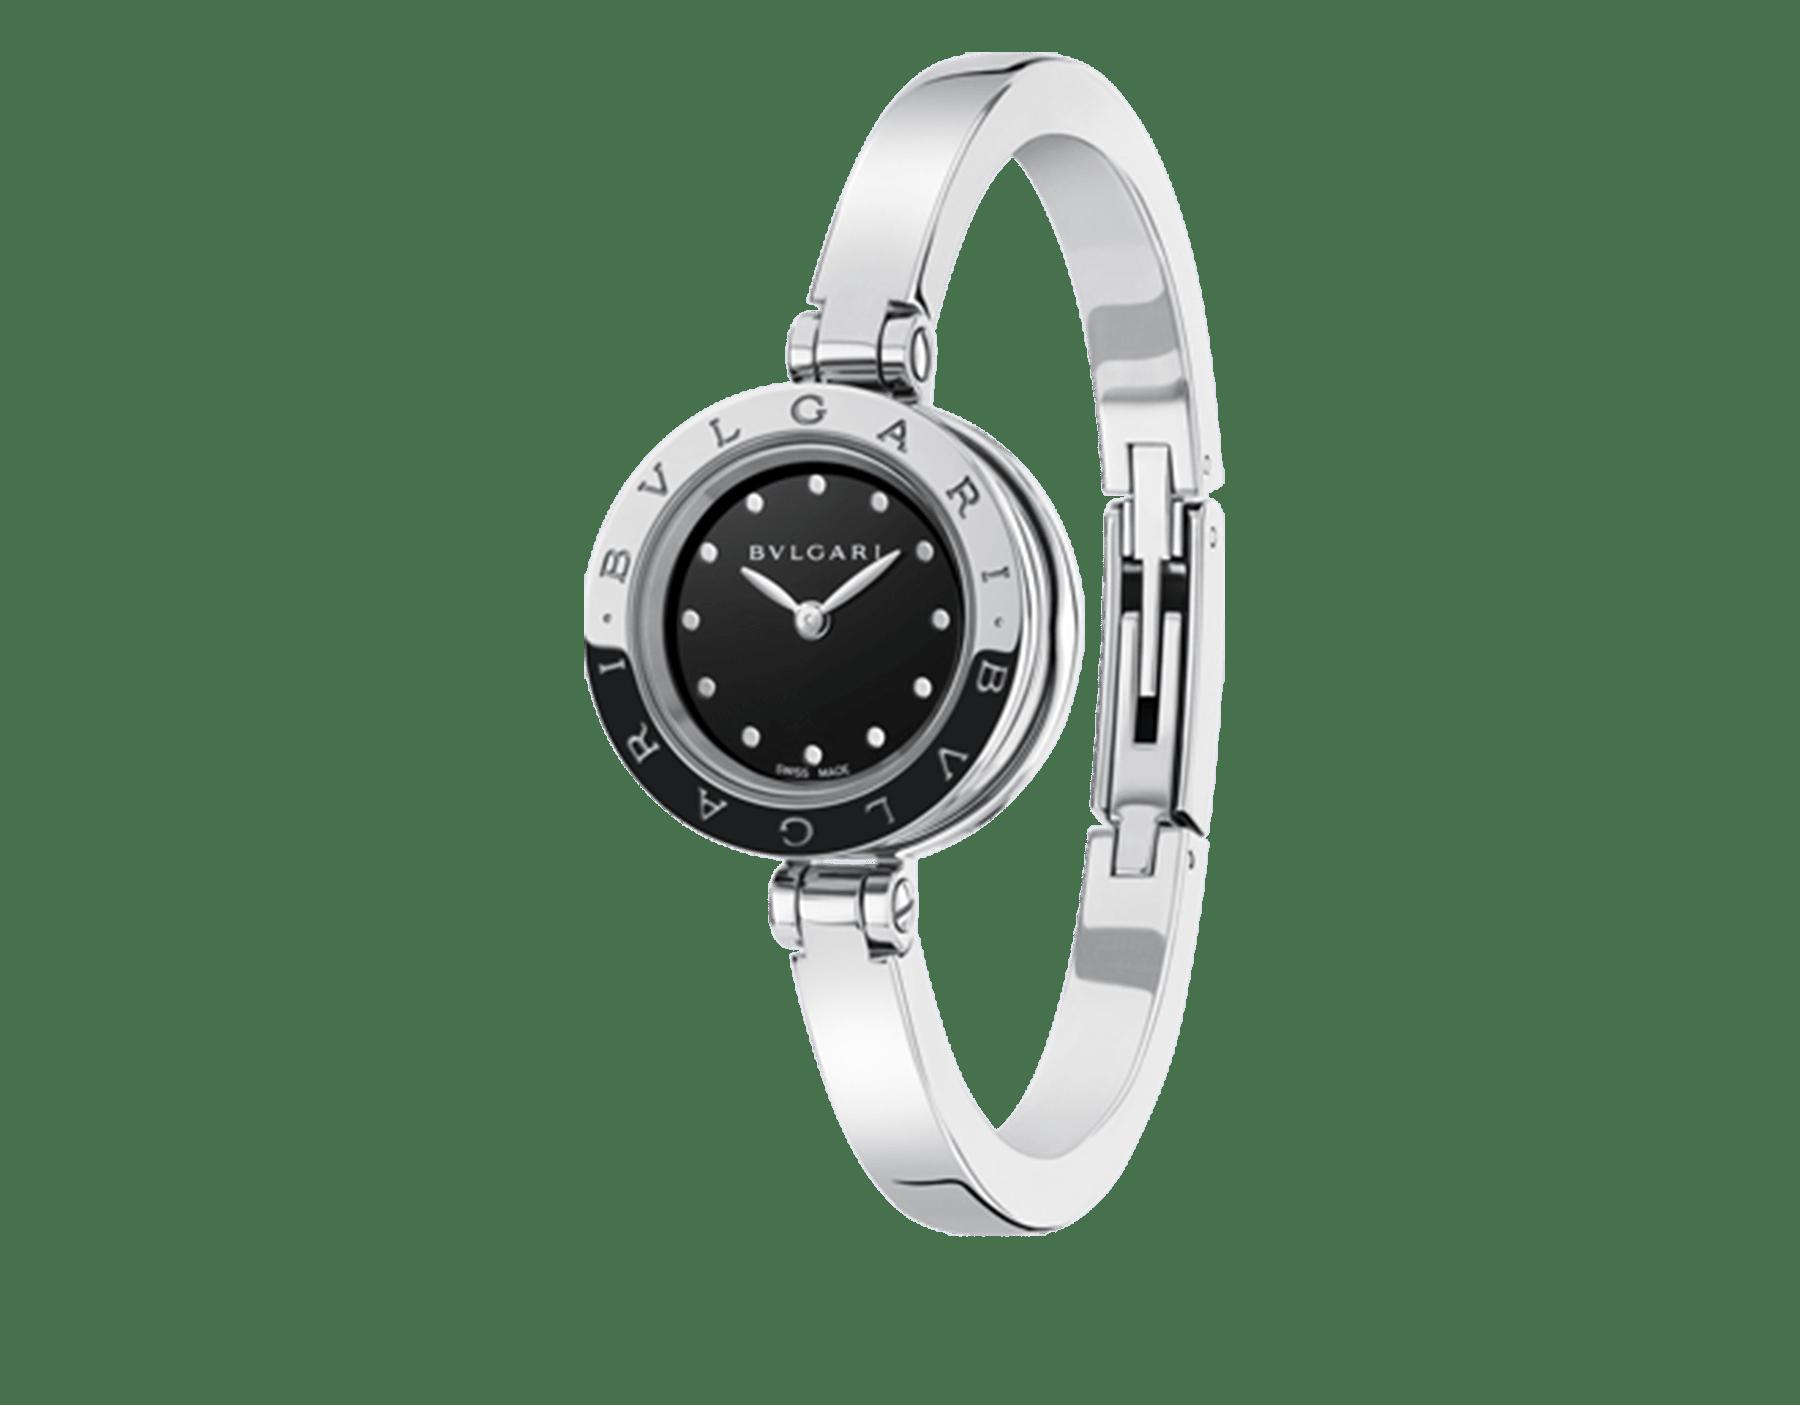 B.zero1 腕錶,精鋼錶殼和手鐲,黑色漆面錶盤。M 尺寸。 102319 image 1